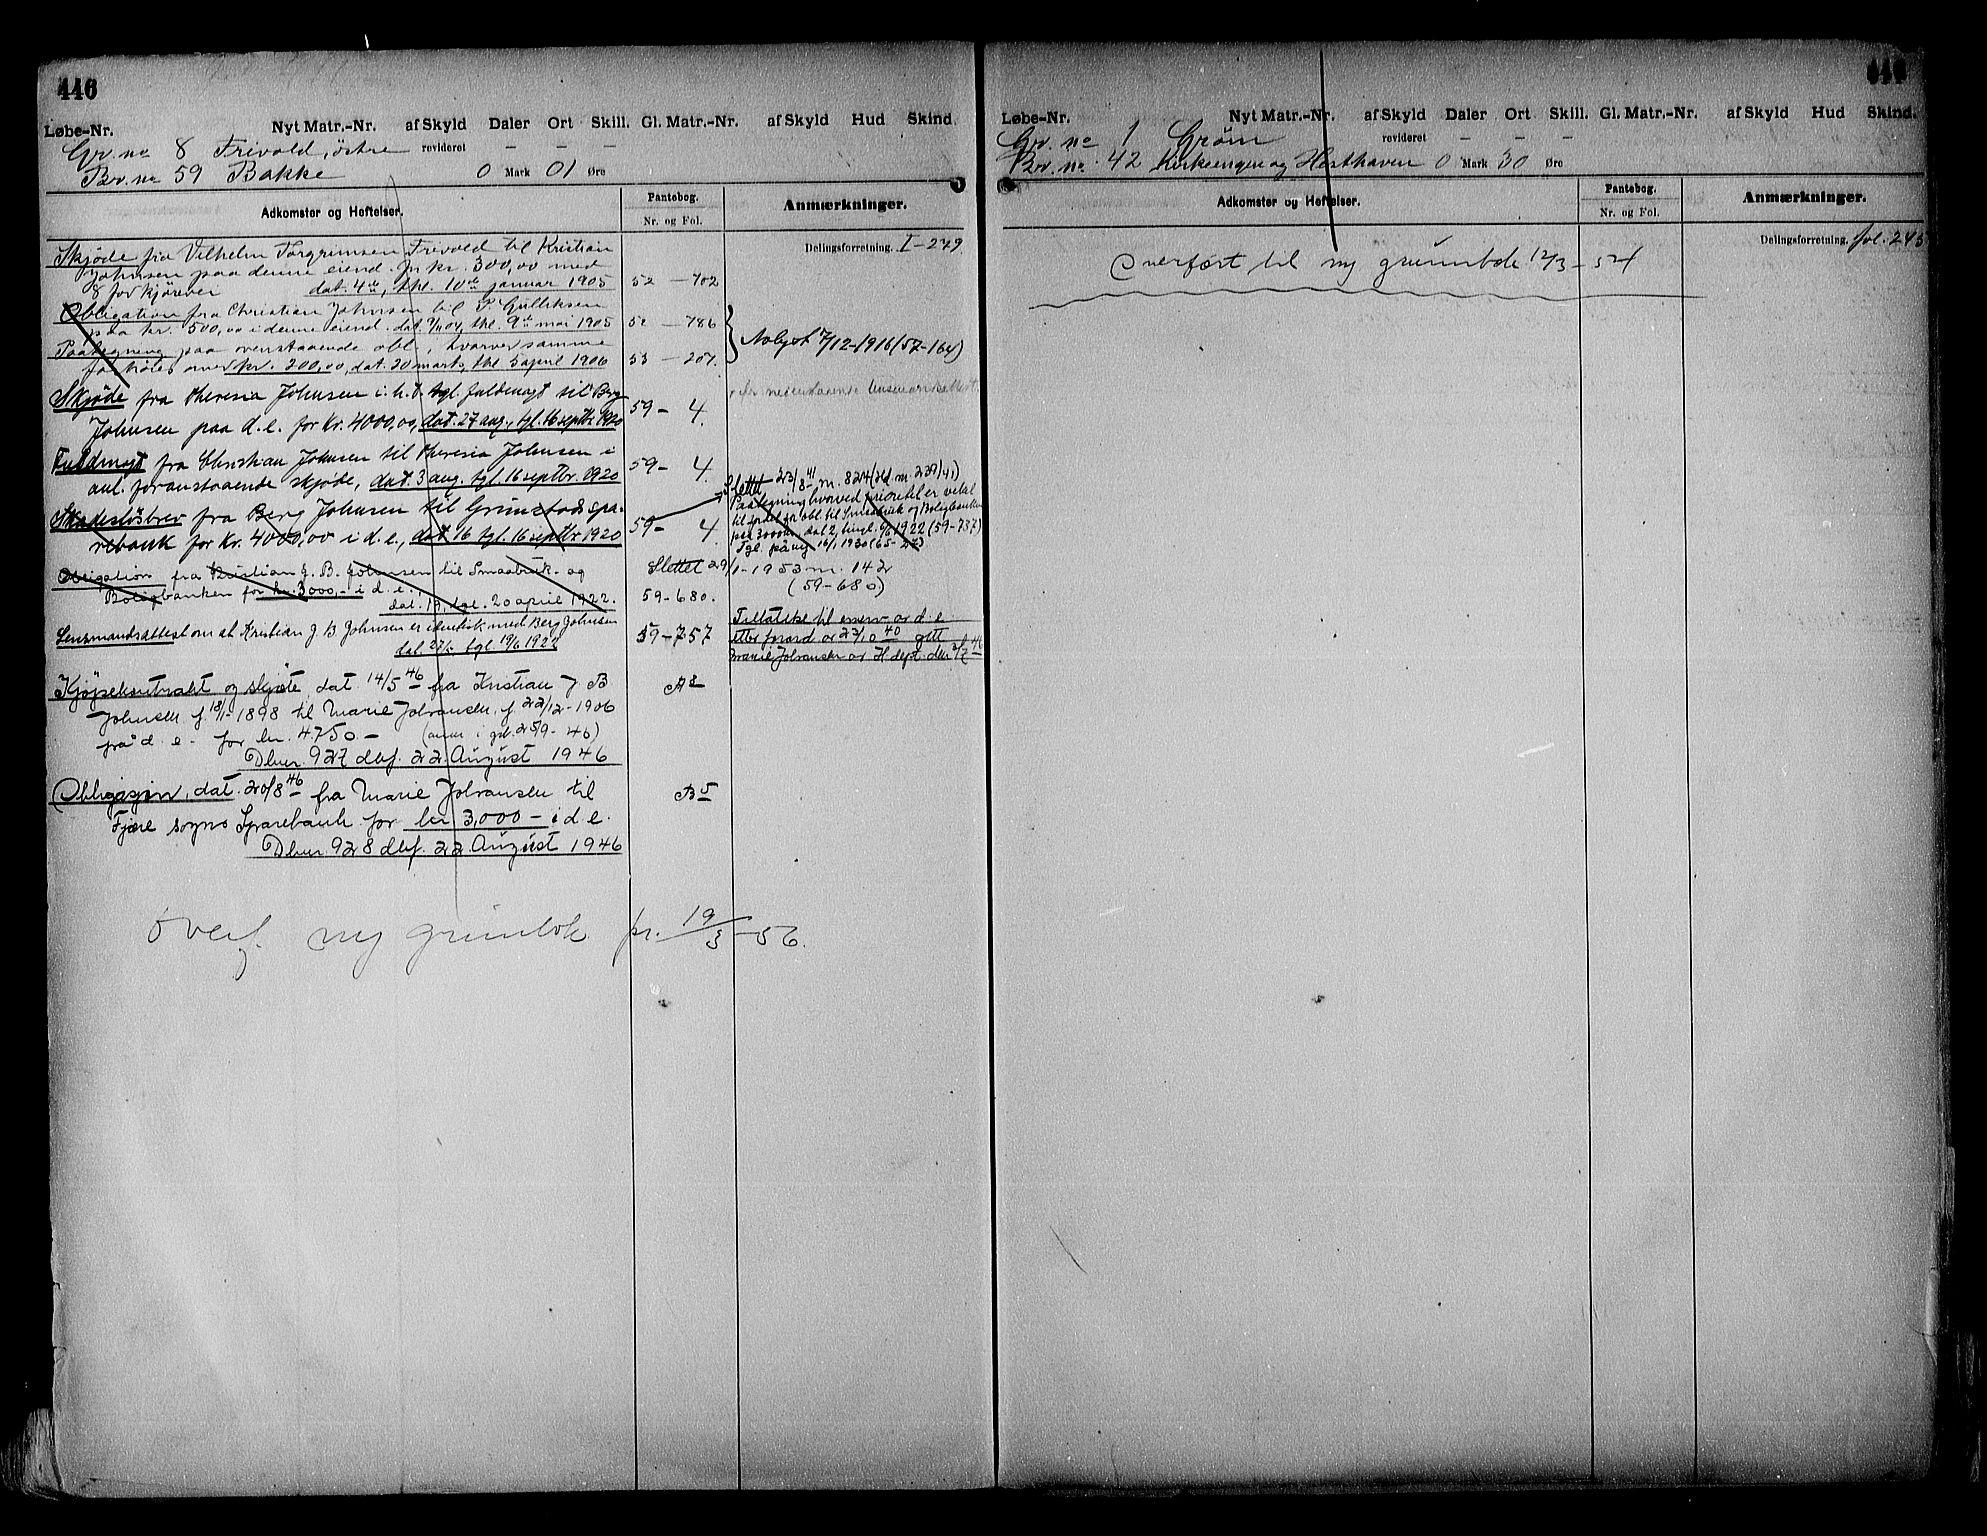 SAK, Vestre Nedenes/Sand sorenskriveri, G/Ga/L0018: Panteregister nr. 13b, 1872-1956, s. 446